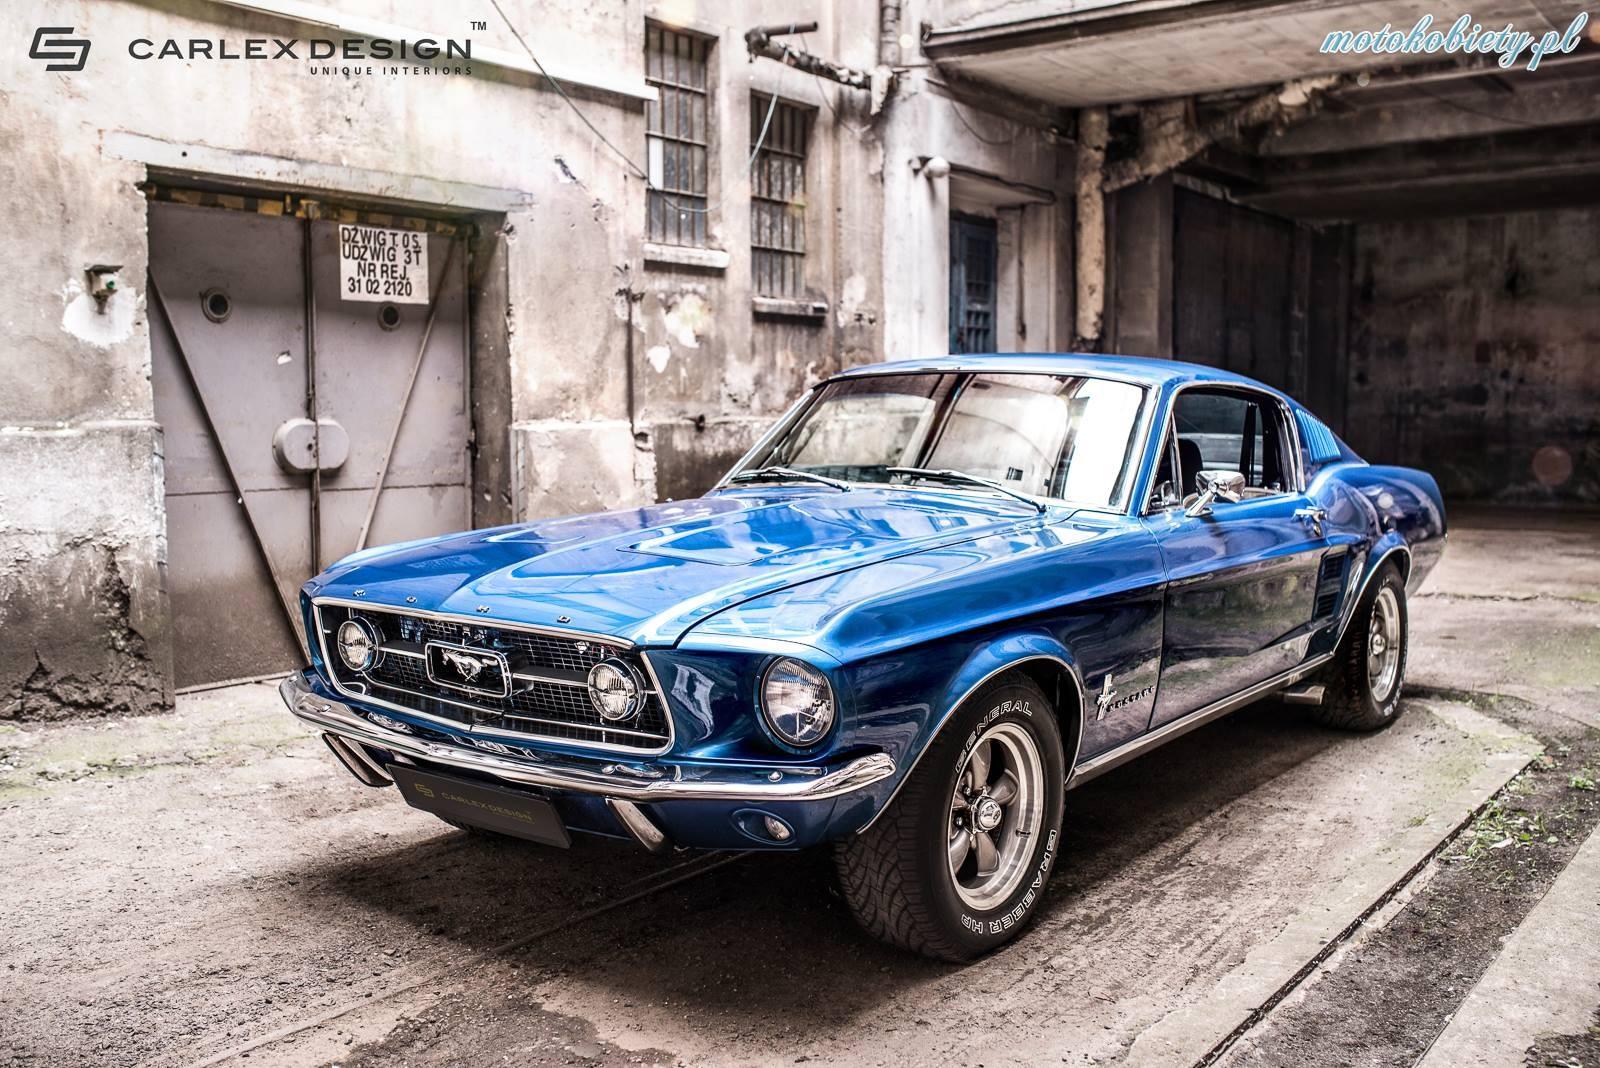 Ford Mustang 1967 Carlex Design